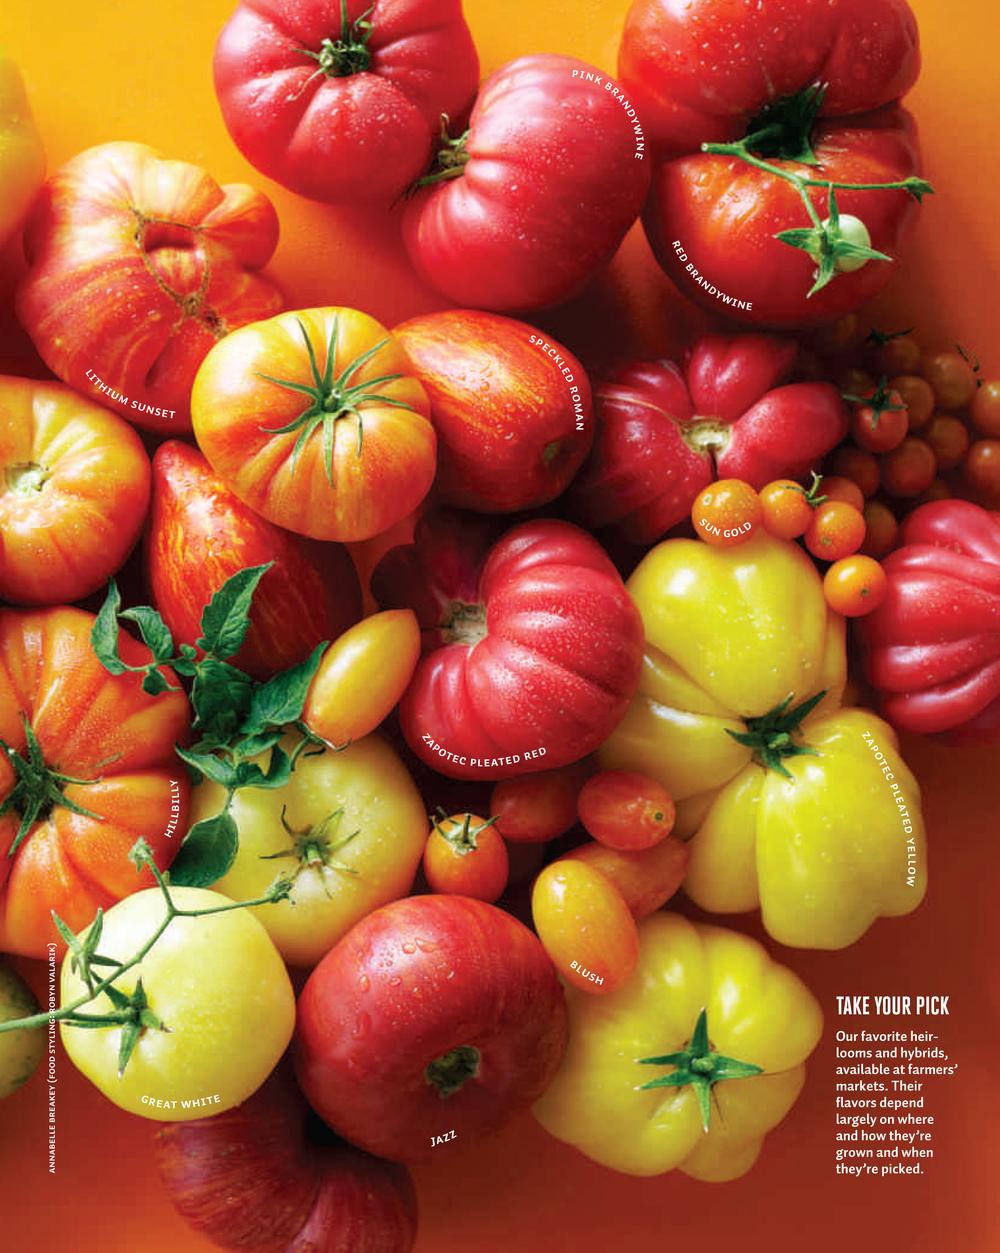 fcc0812t_Tomatoes-1-2.jpg